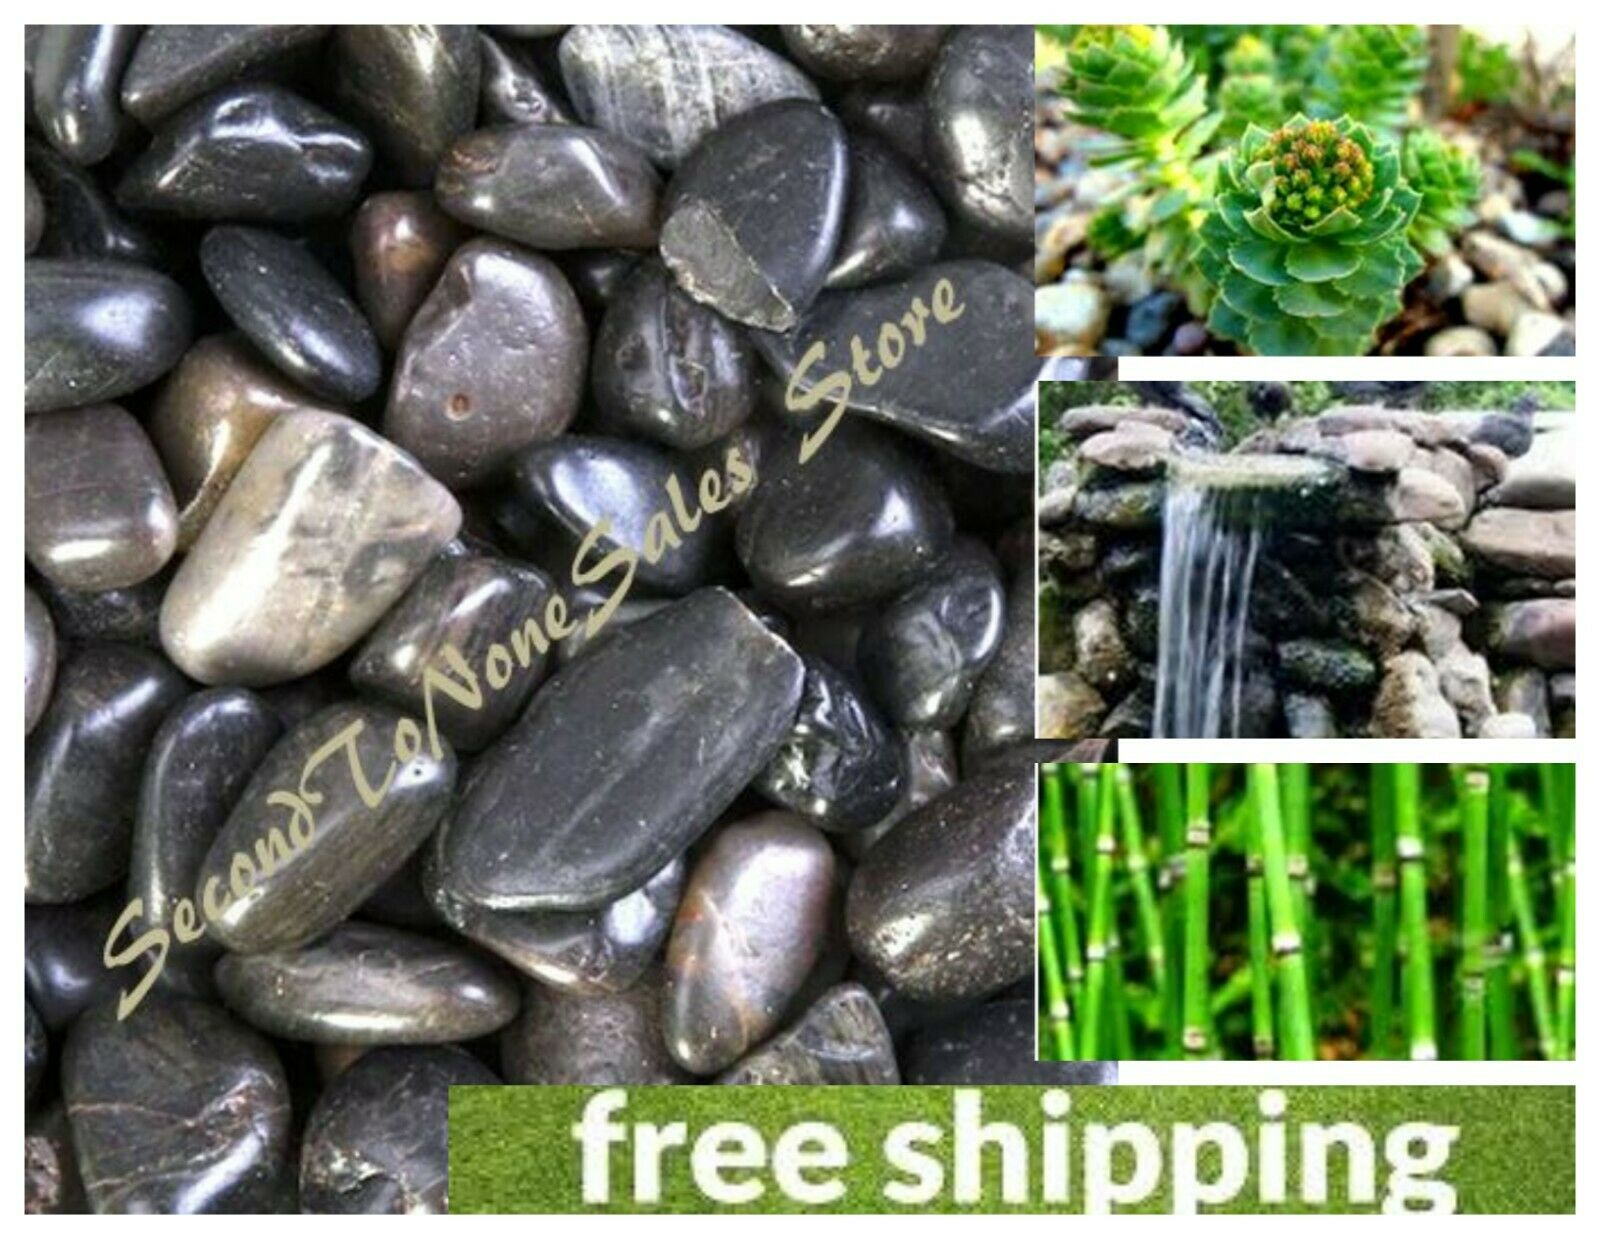 Polished Black River Rocks Natural Decorative Stones Garden Fountain Display 5lb